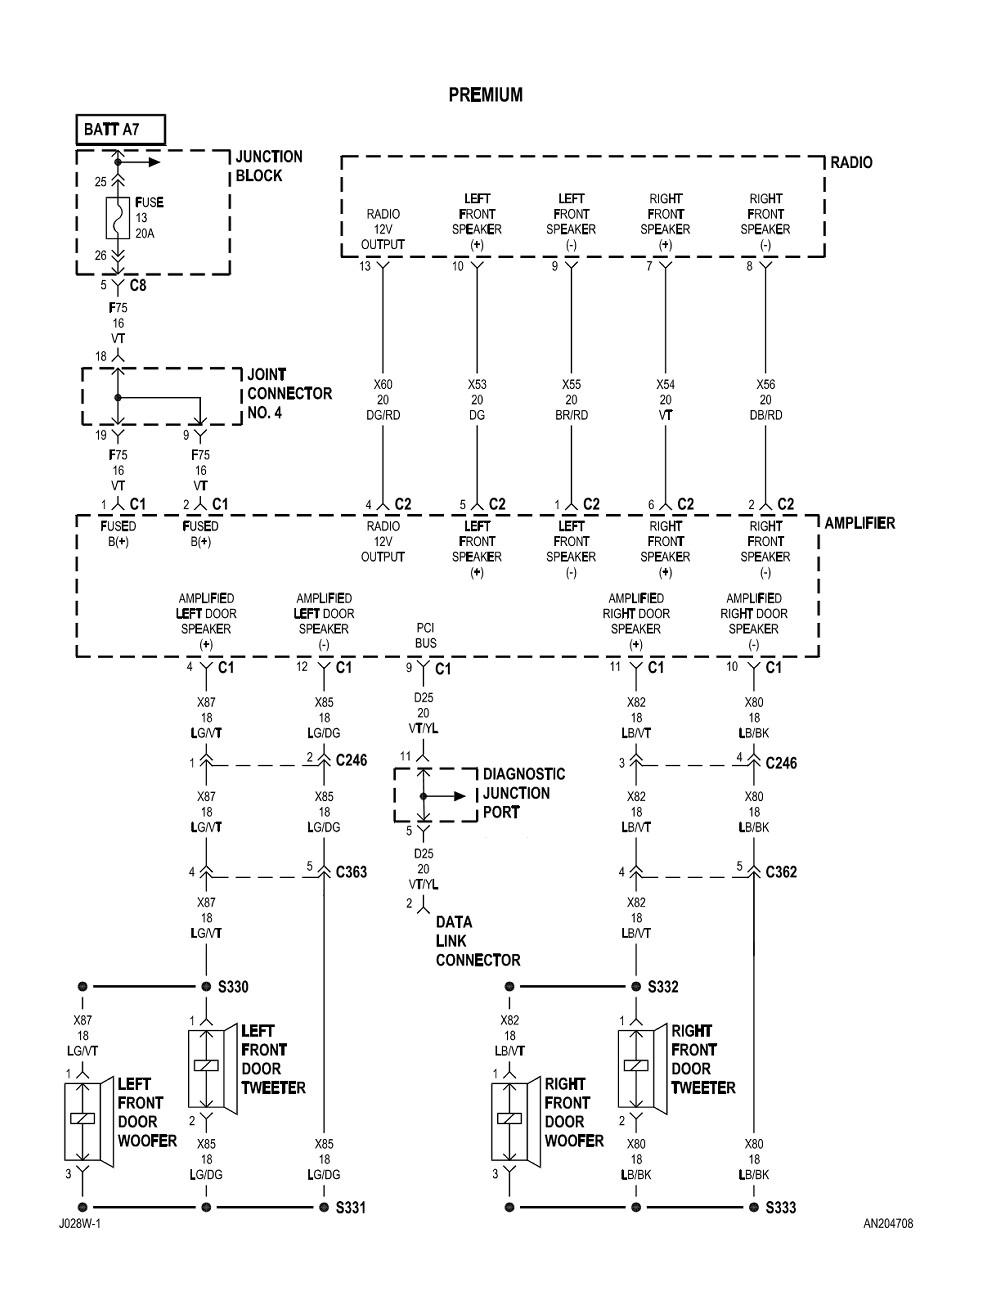 hight resolution of 98 dakota radio wiring diagram complete wiring diagrams u2022 rh oldorchardfarm co 2005 dodge caravan radio 2007